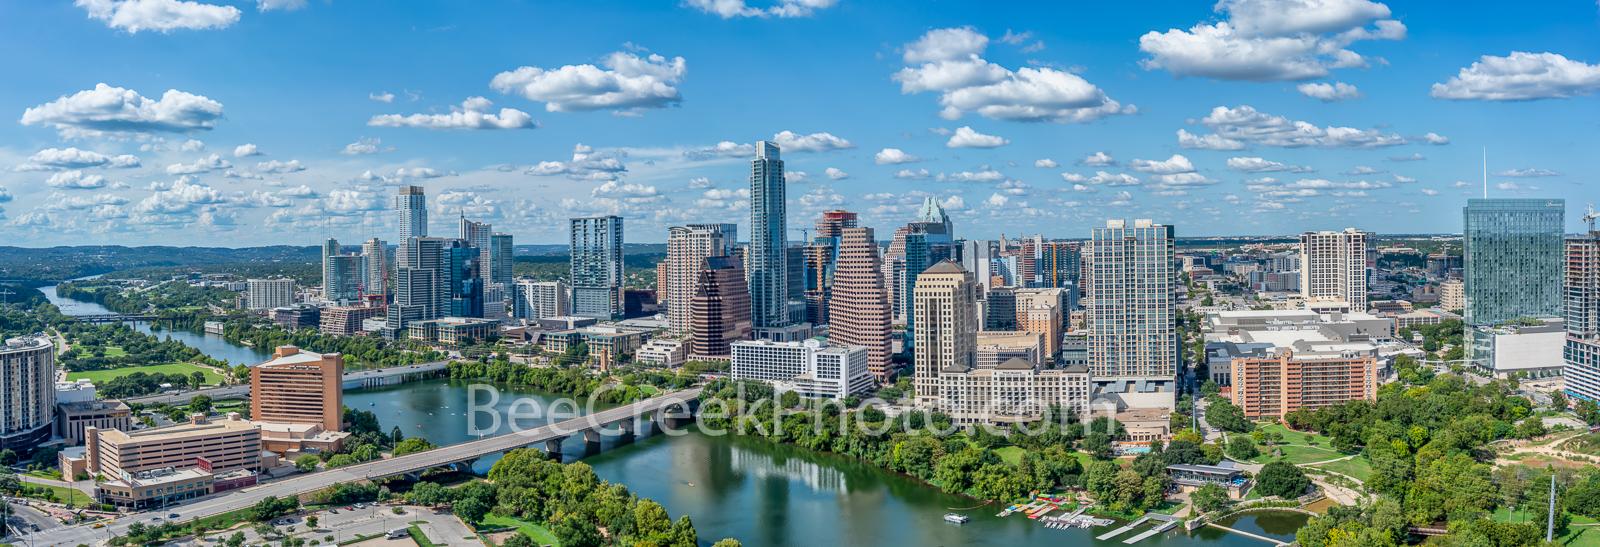 texas, austin skyline, austin, austin downtown, downtown austin, austin texas, austin tx,skyscraper, high rise, buildings, aerial, usa, city of austin,  pano, panorama, city of austin, lady bird lake,, photo